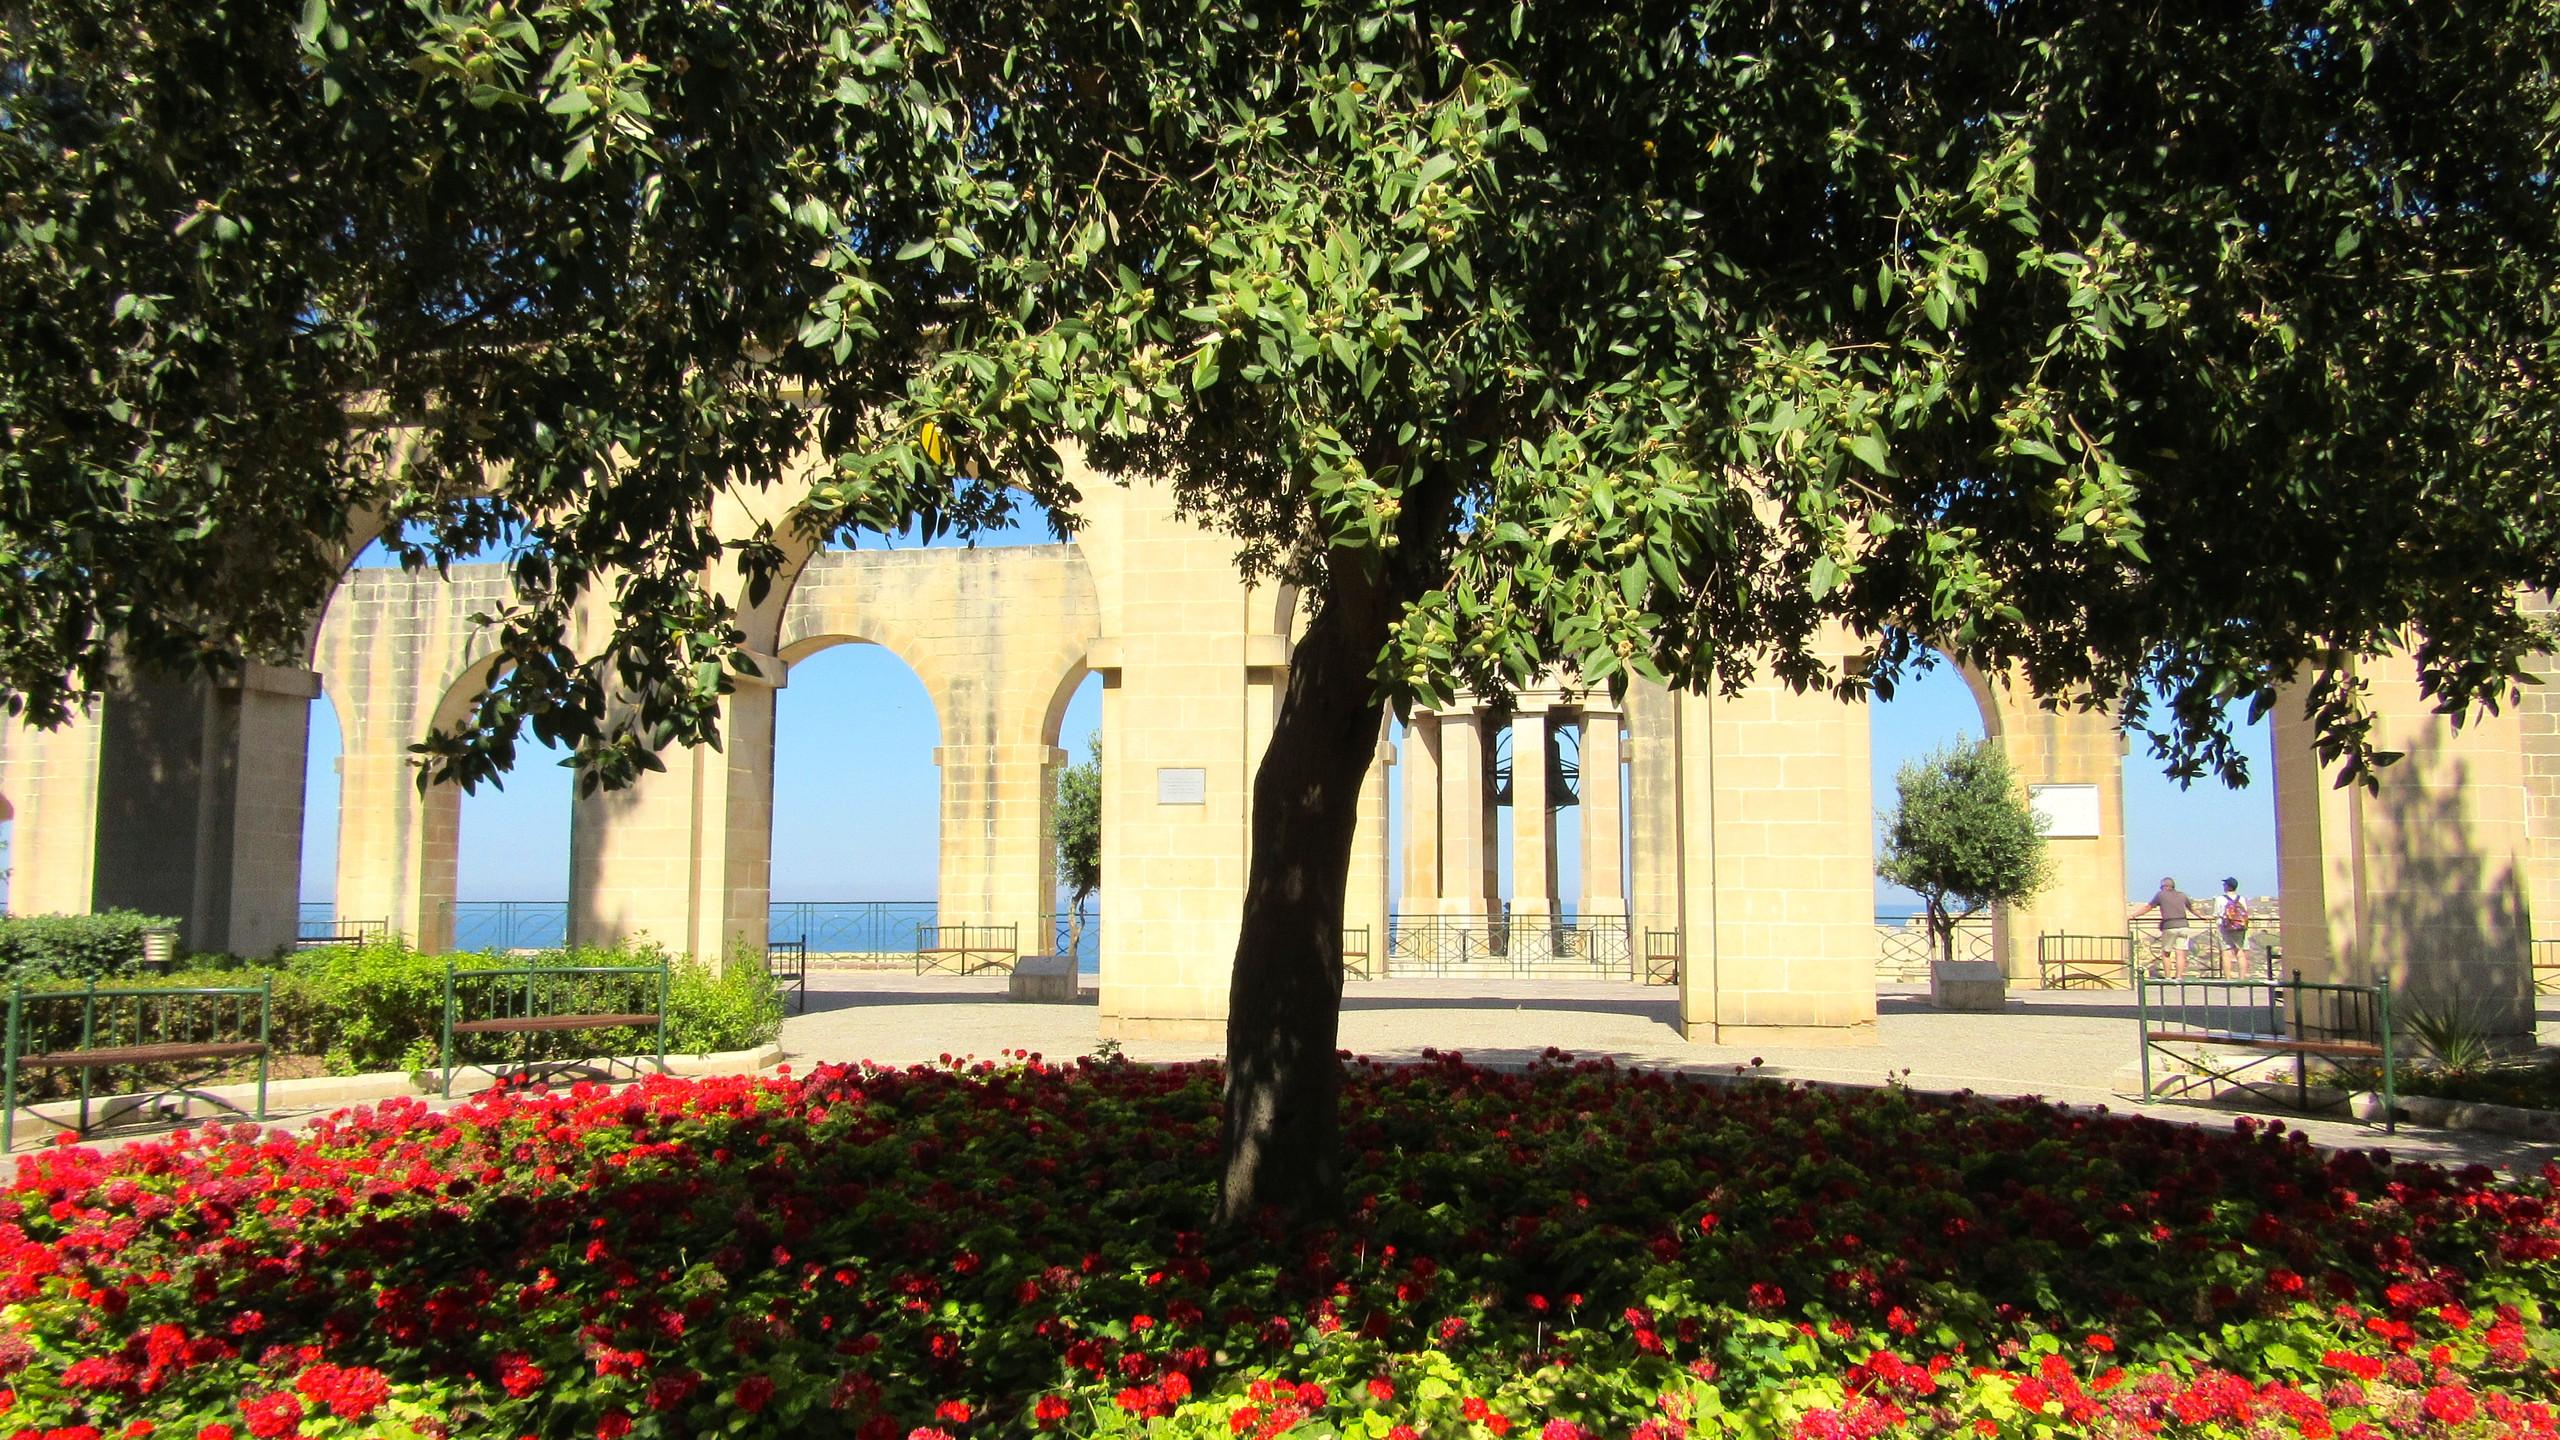 Lower Barracca Gardens